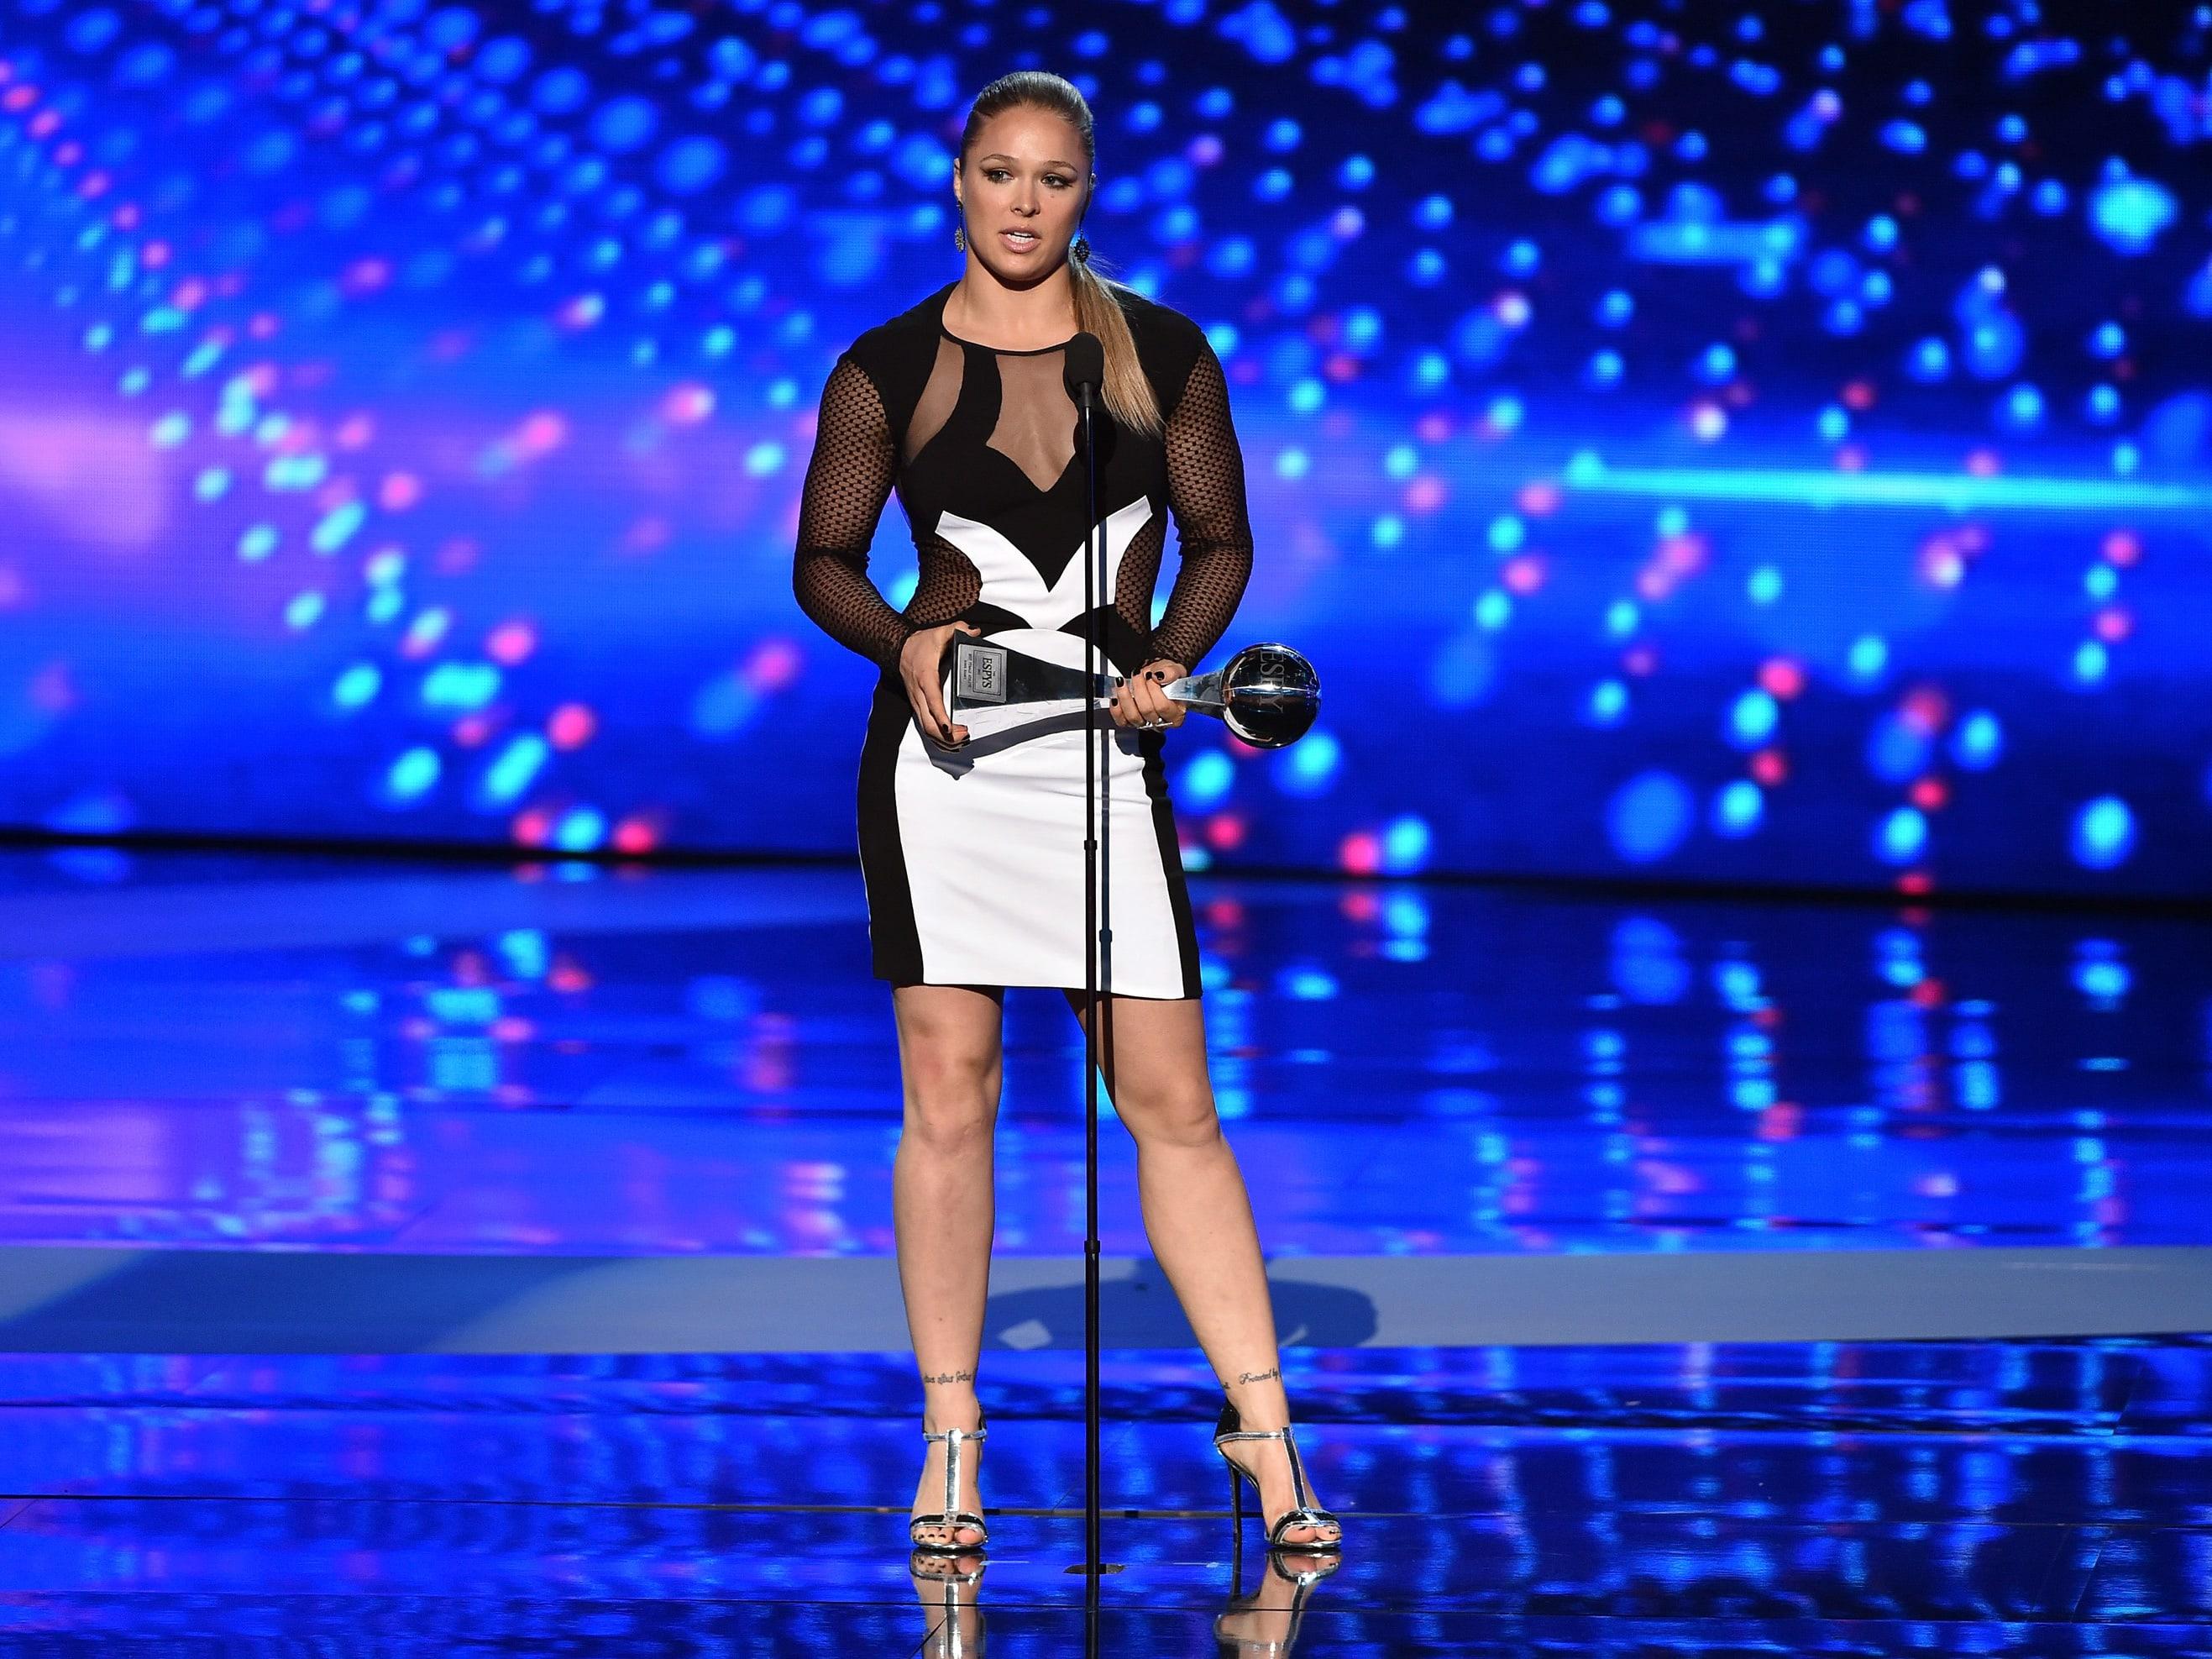 Ronda Rousey HD